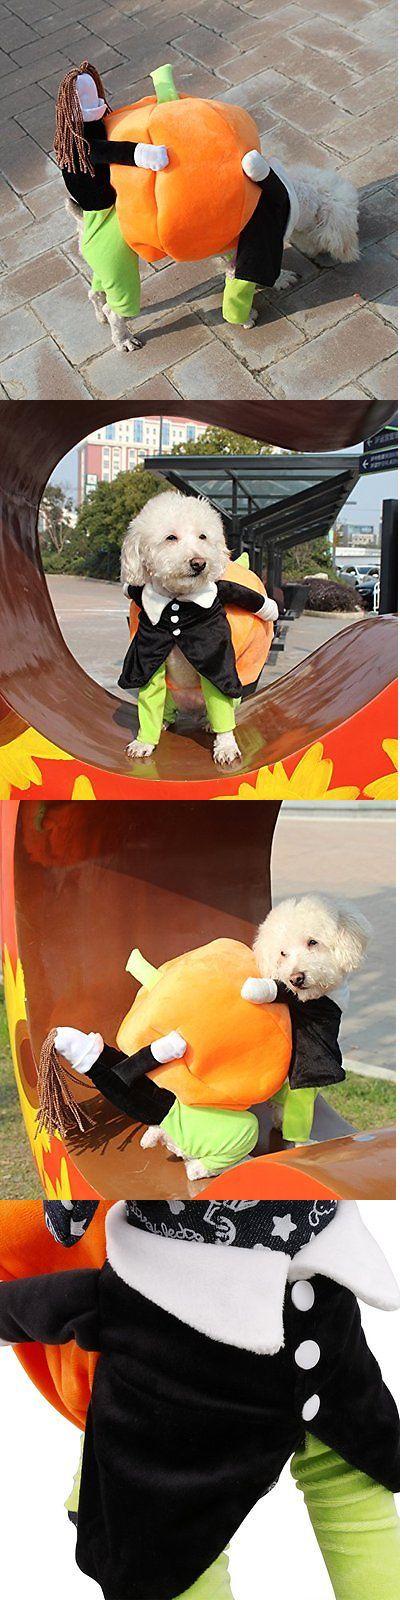 Costumes 52352: Iiniim Pet Dog Cat Carrying Pumpkin Halloween Costume Fancy Party Jacket Apparel BUY IT NOW ONLY: $32.97